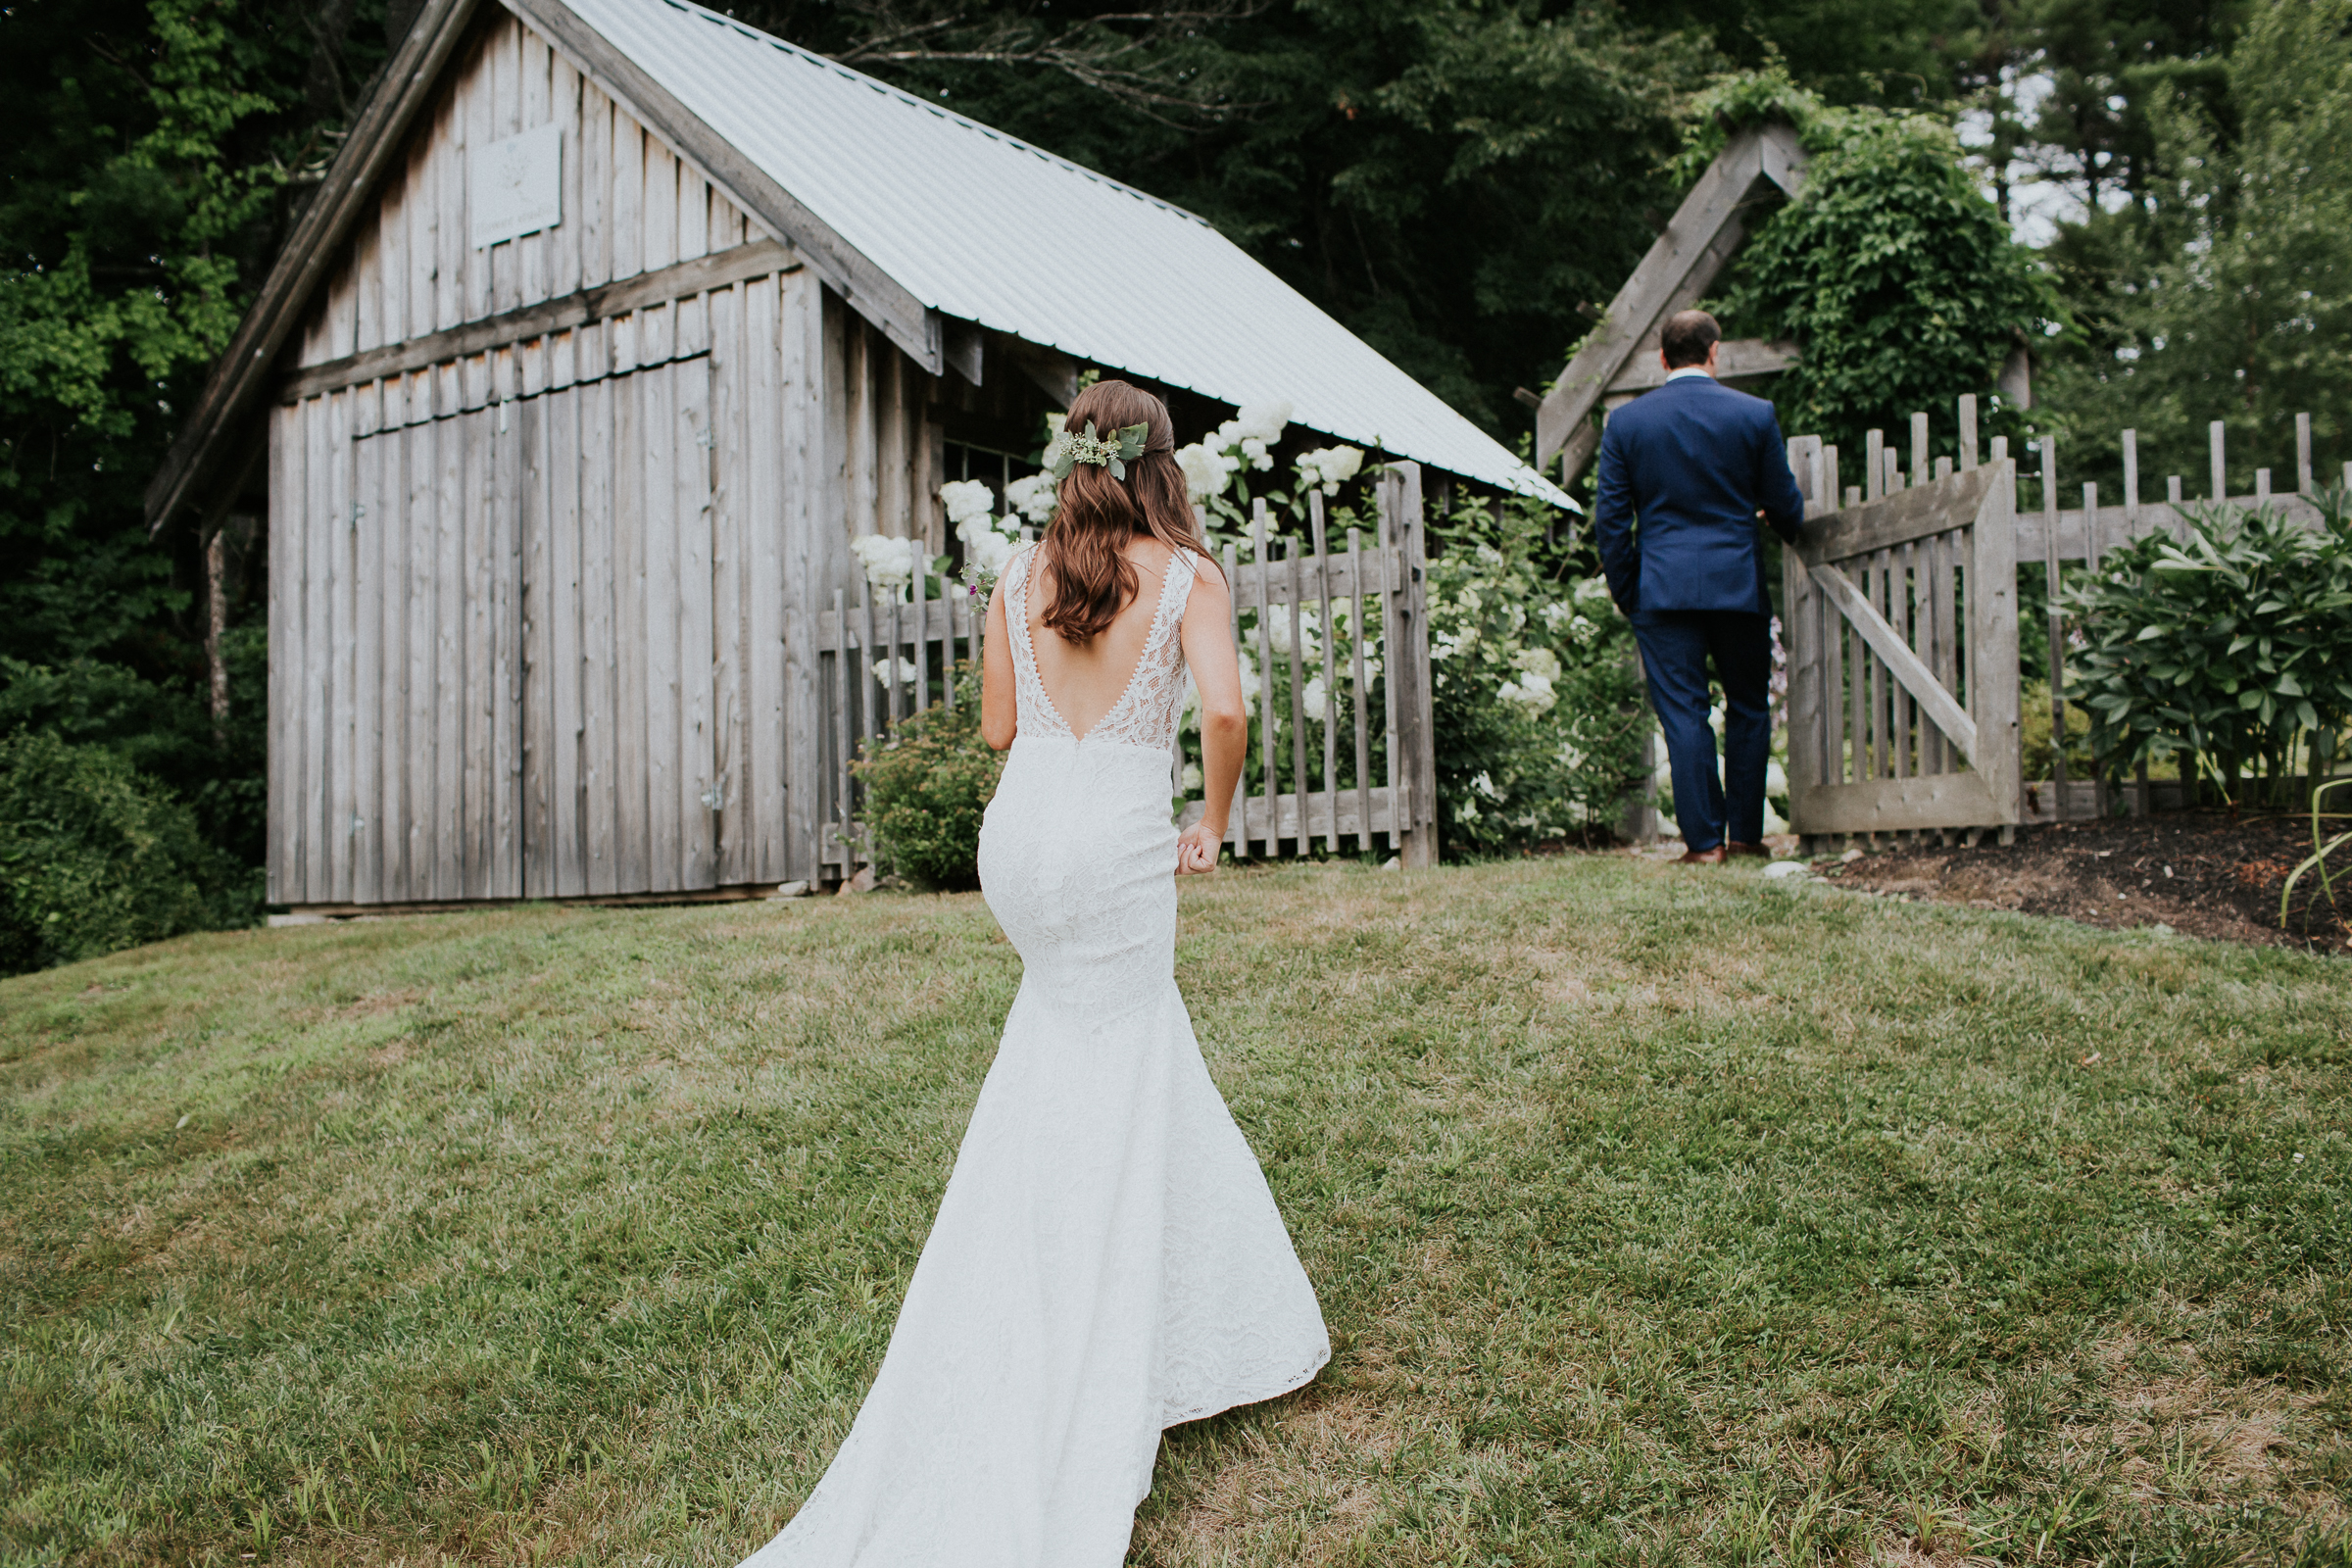 Marianmade-Farm-Wiscasset-Maine-Fine-Art-Documentary-Wedding-Photographer-Elvira-Kalviste-Photography-29.jpg